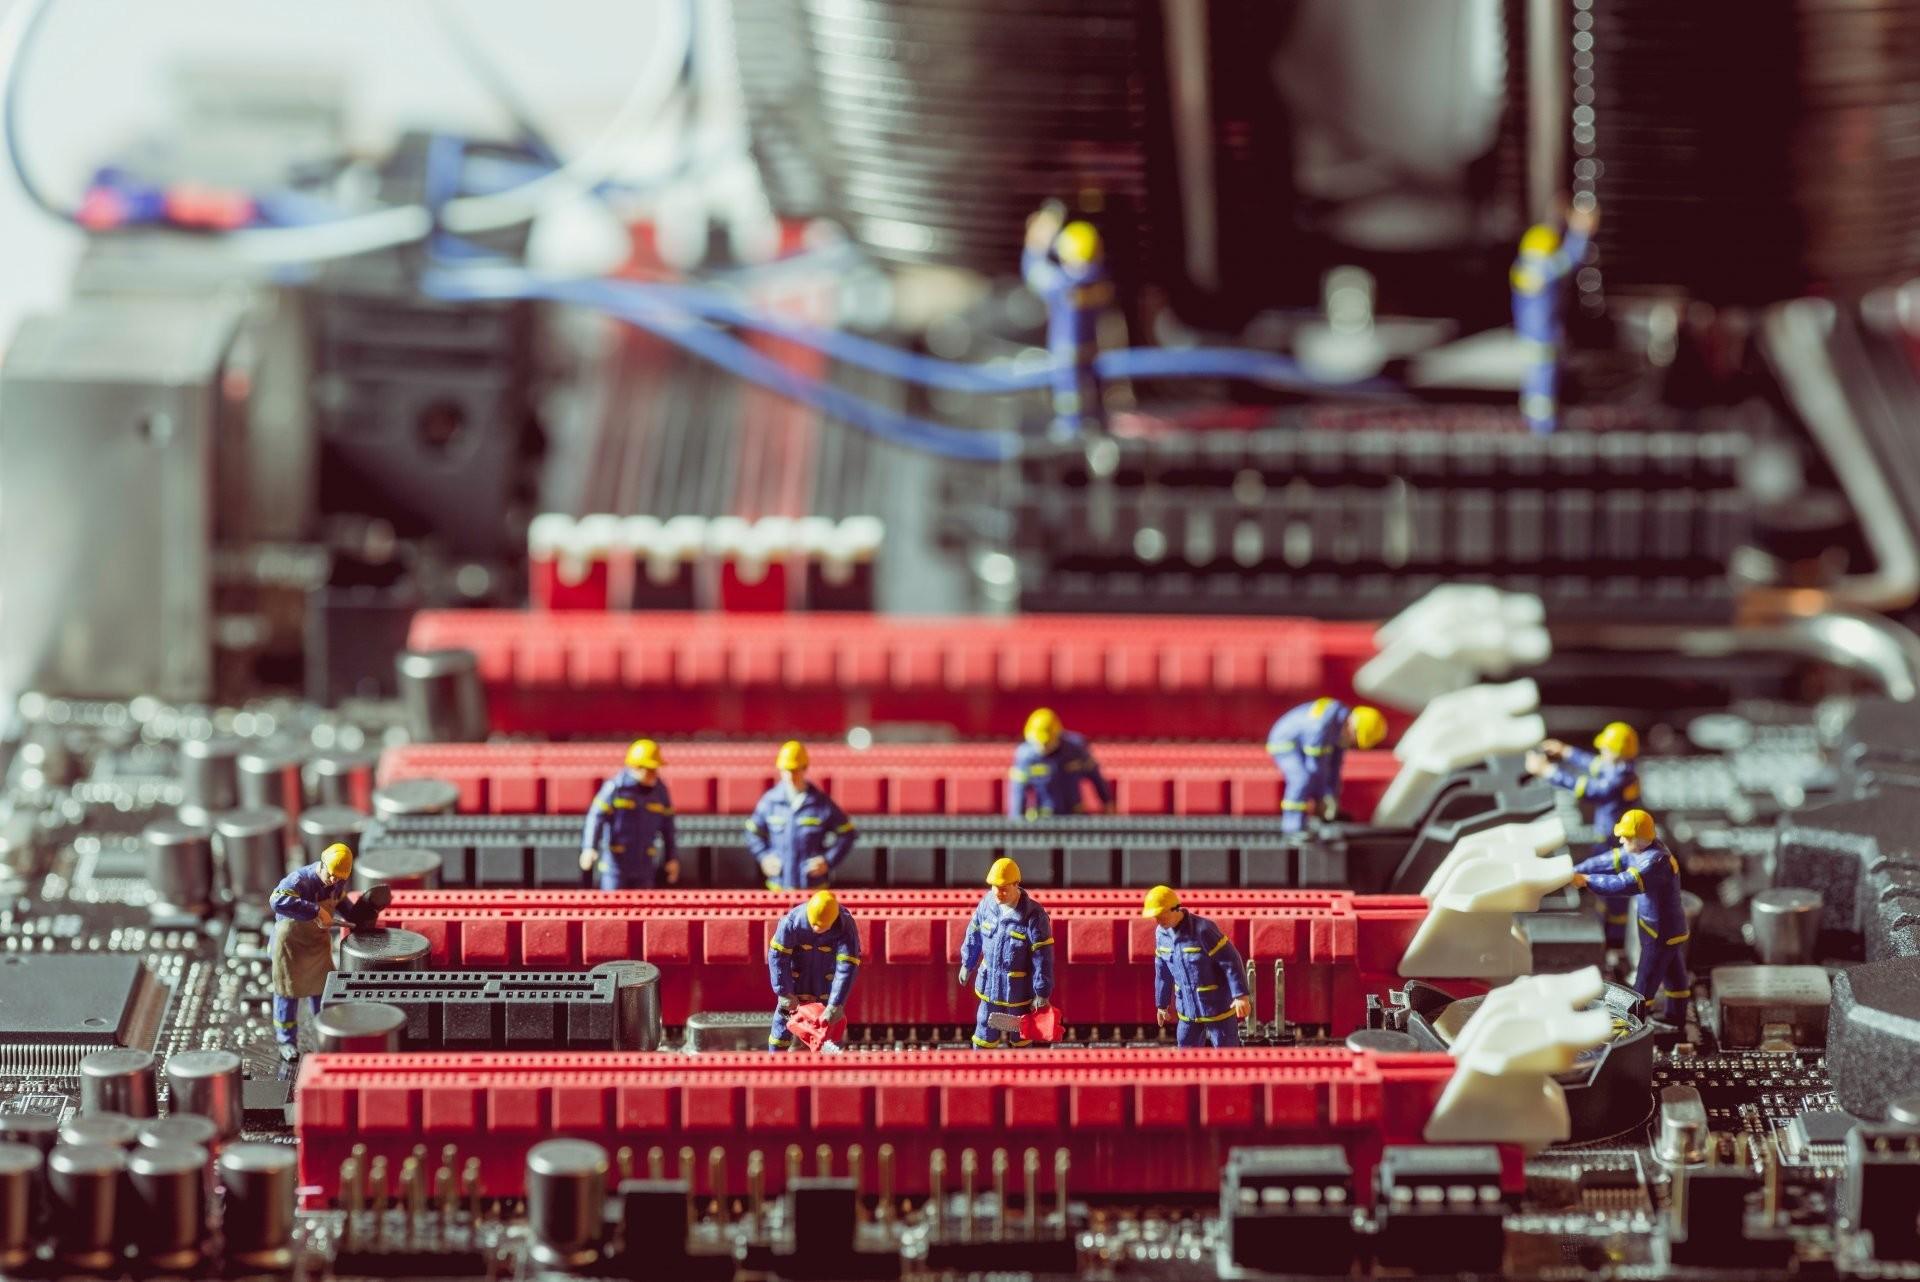 motherboard socket ram dolls chainsaw